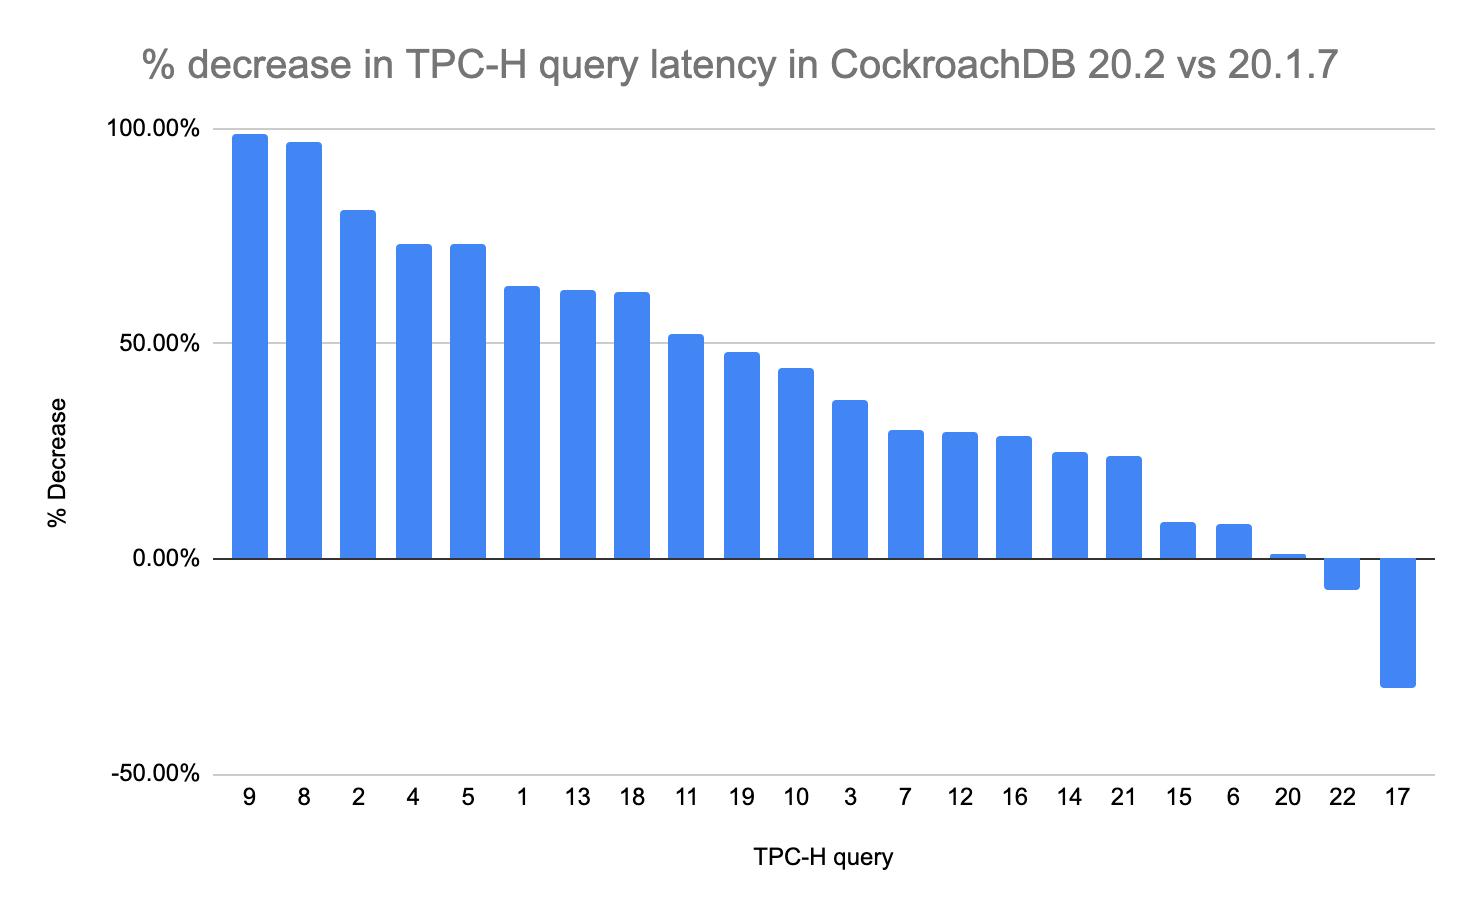 CockroachDB 20.2 performance on TPC-H